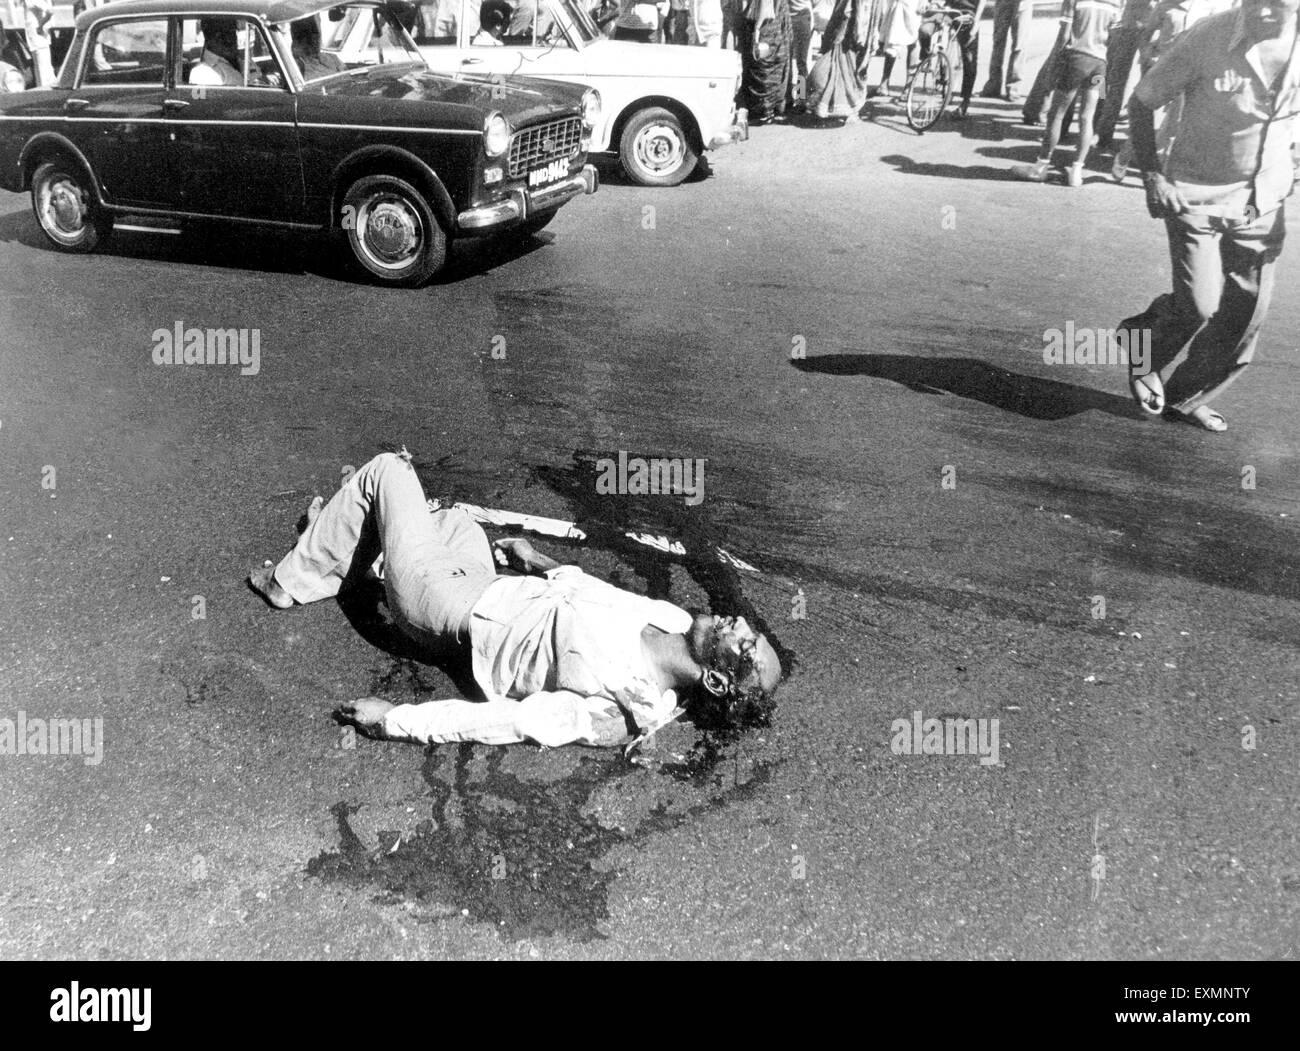 dead man road accident mumbai street india Stock Photo